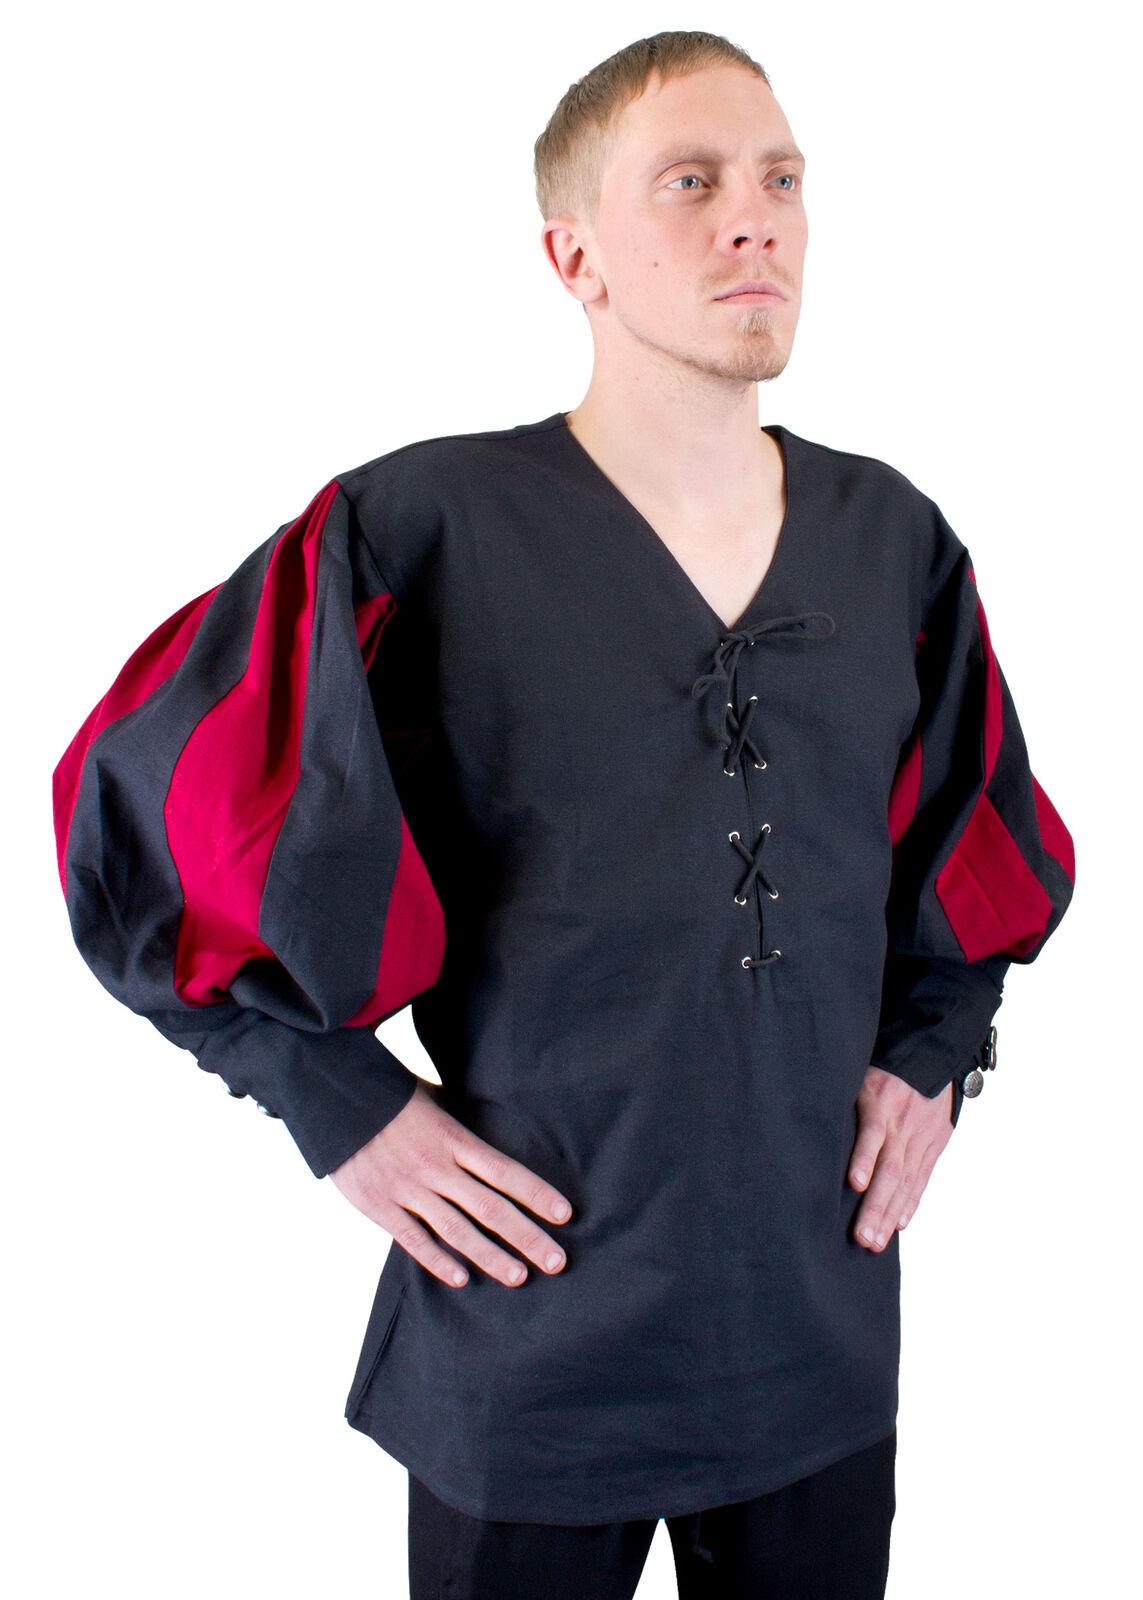 Landsknecht Shirt, black/dark red, Medieval LARP Costume Garment